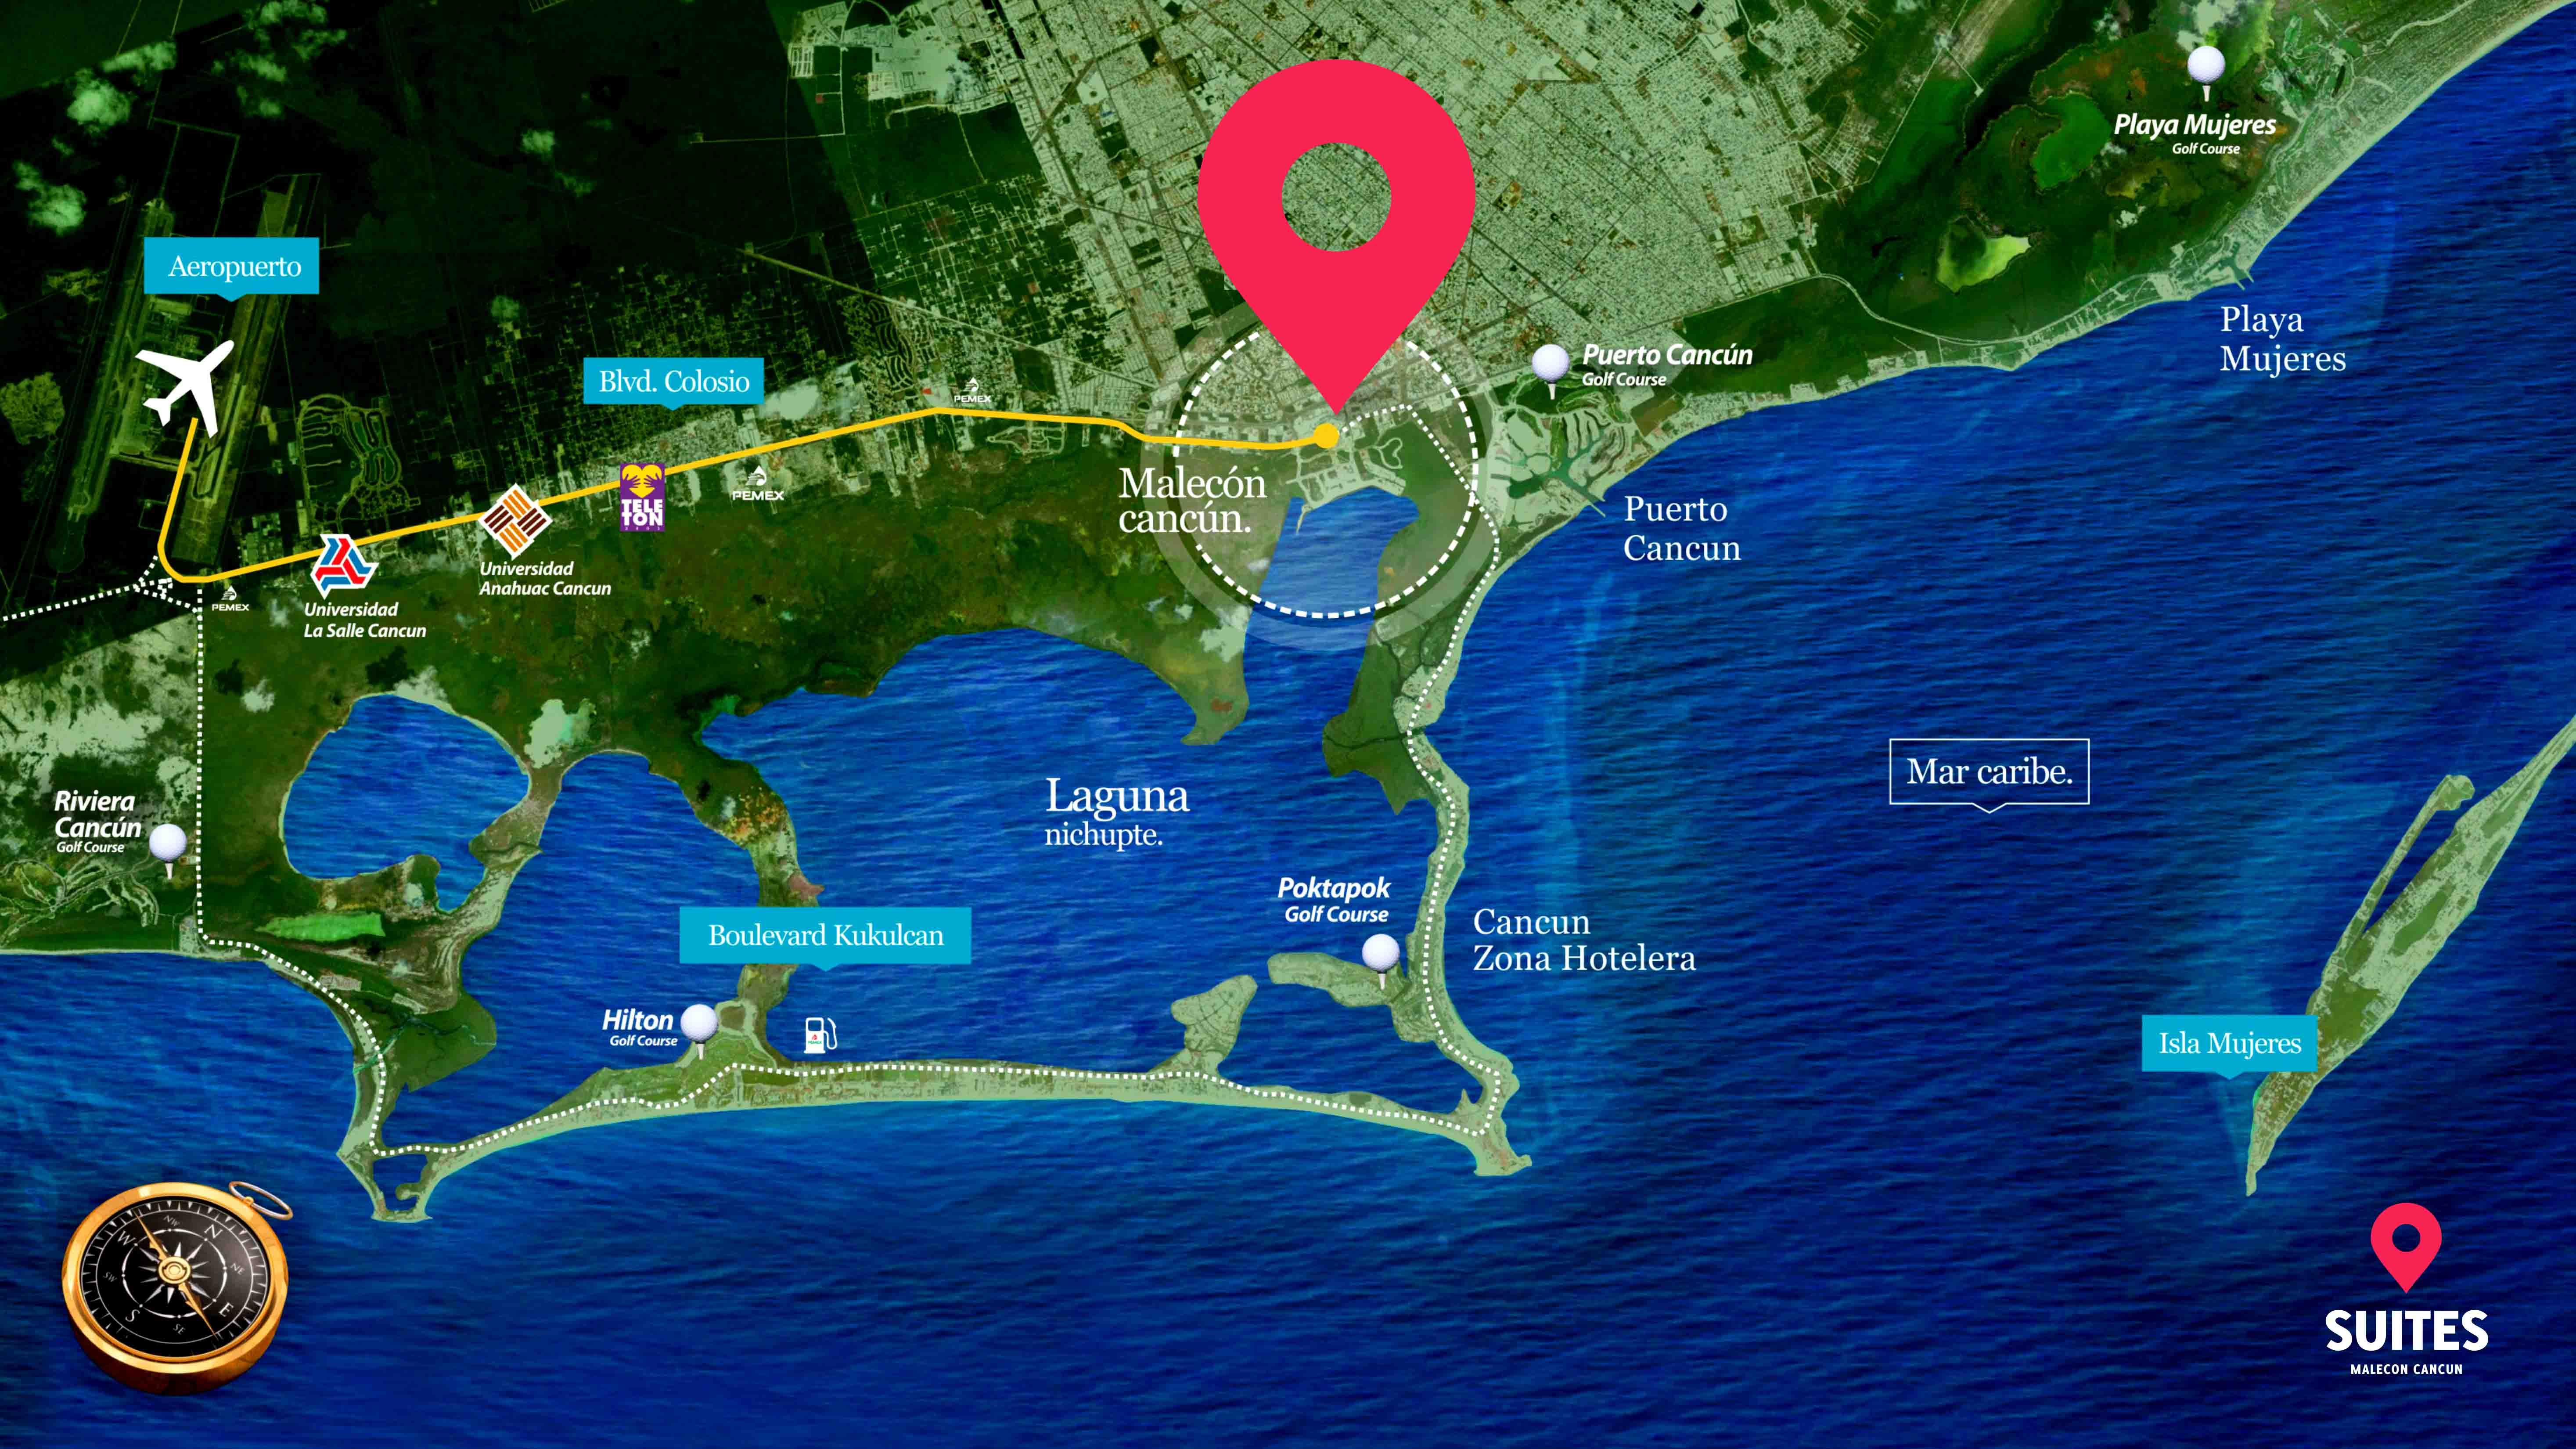 Mapa de Suites Malecon Cancún